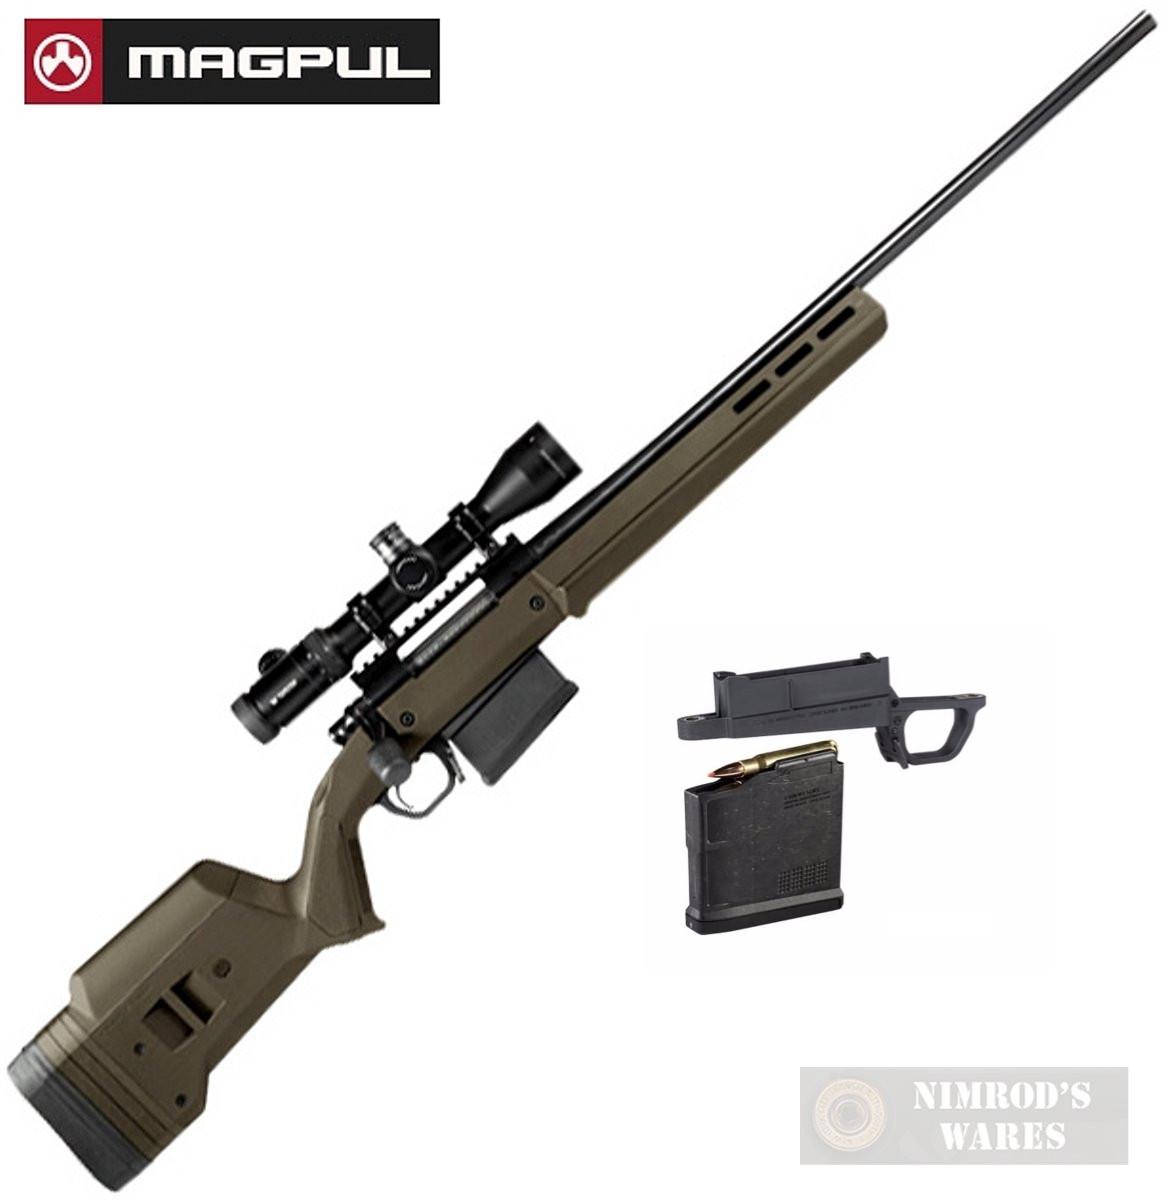 MAGPUL HUNTER 700L Remington 700 Long Action STOCK + Magazine Well +  Magazine MAG483-ODG MAG489-BLK